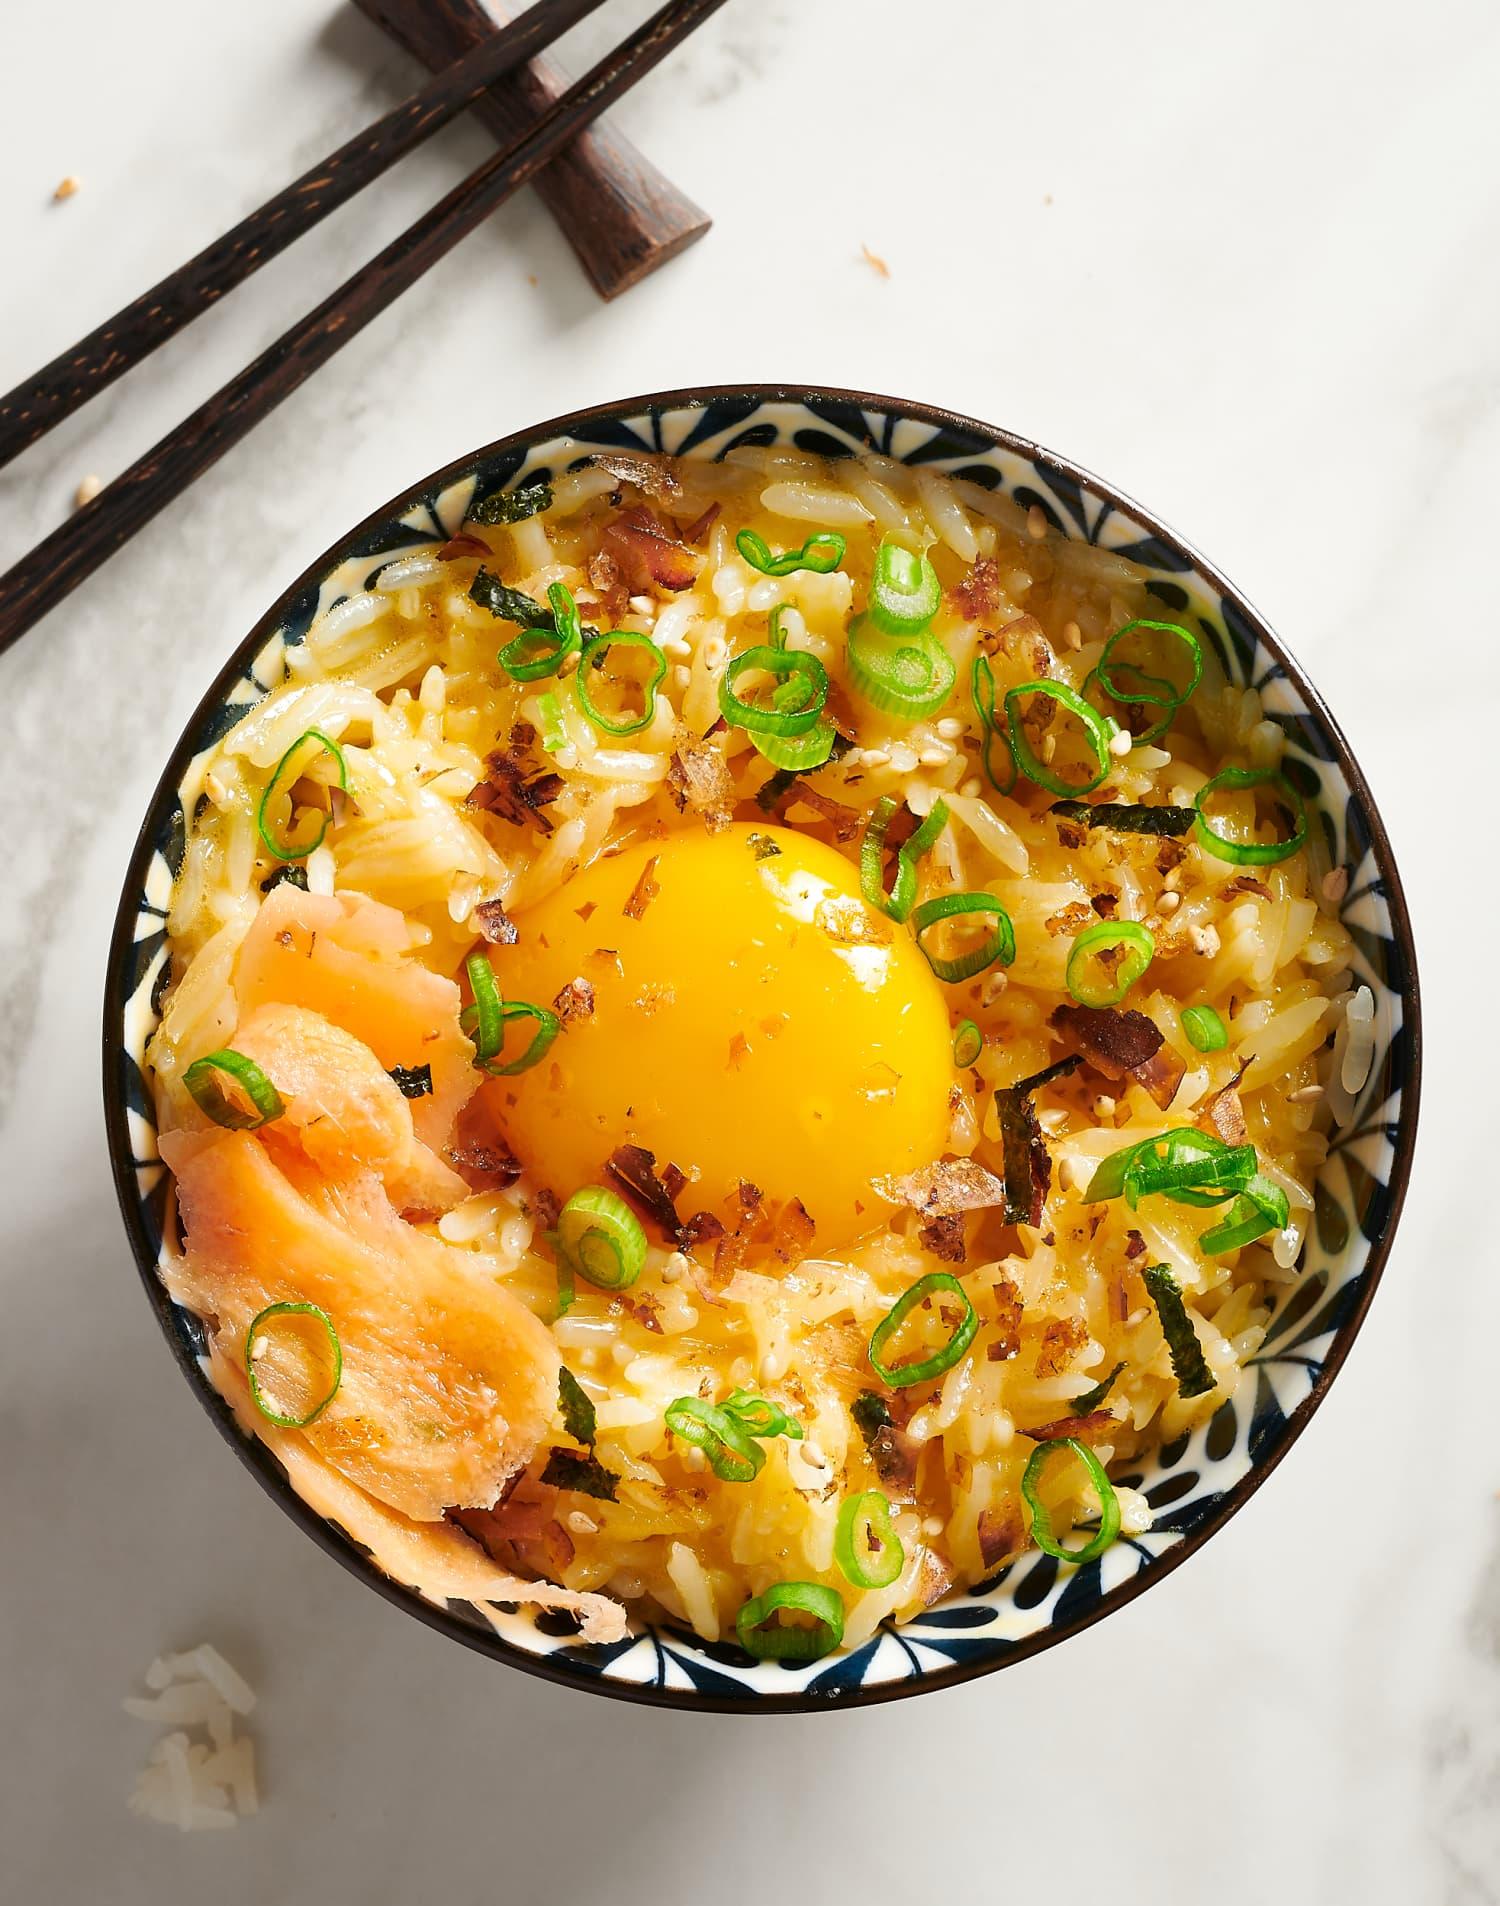 The Easy, Satisfying Japanese Breakfast I Make Again and Again